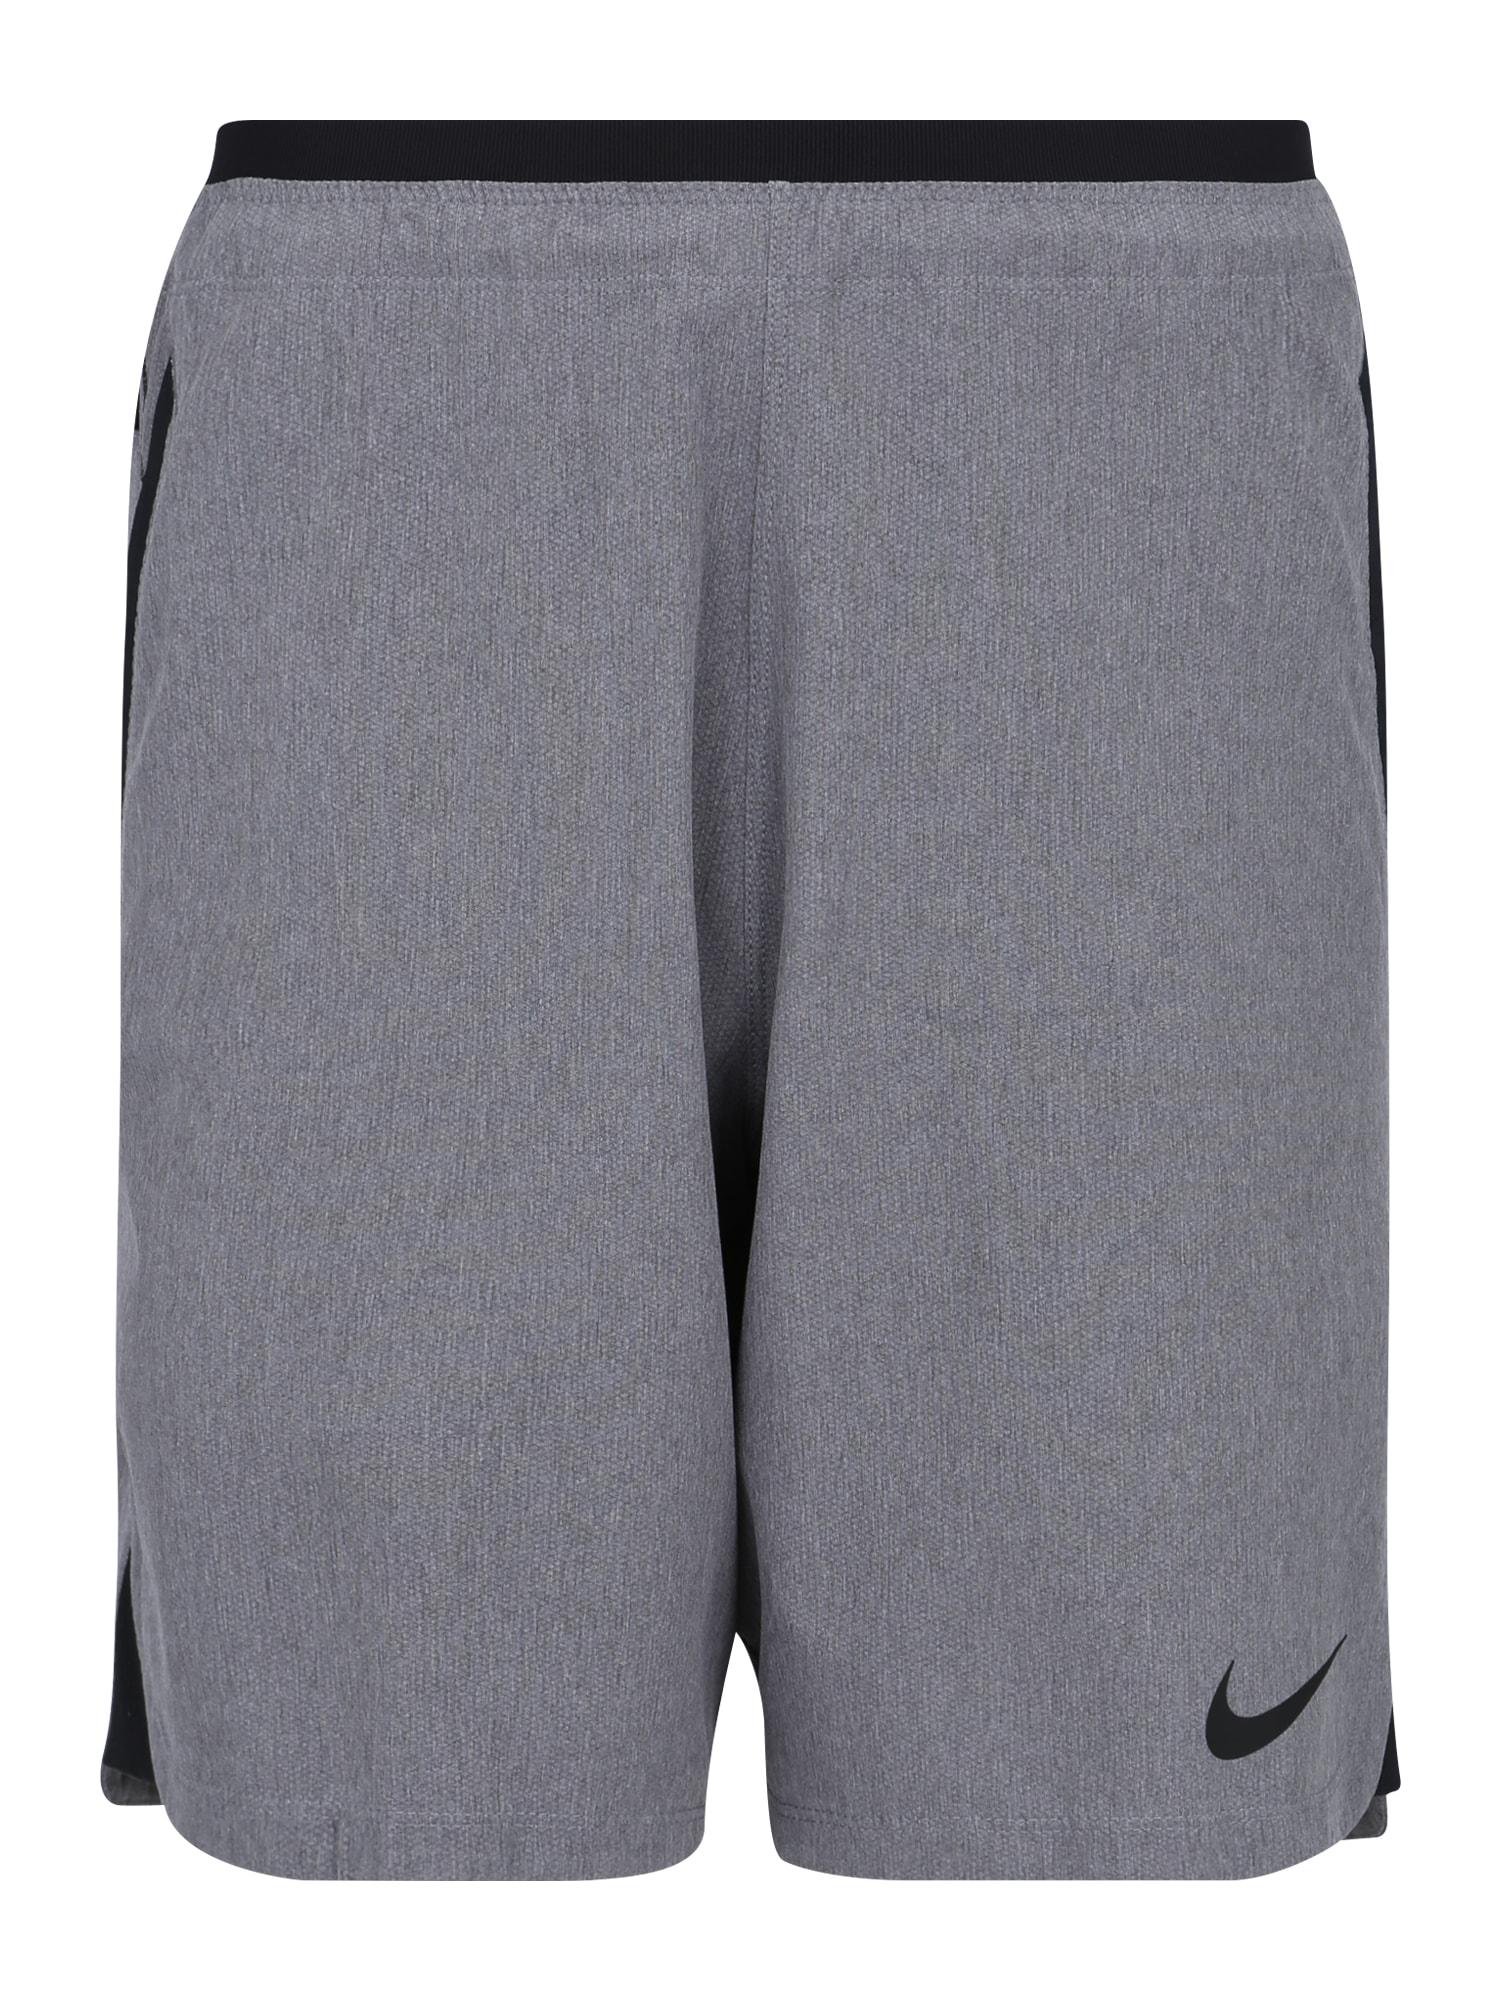 Sportovní kalhoty M NP FLEX REPEL SHORT NPC grau NIKE